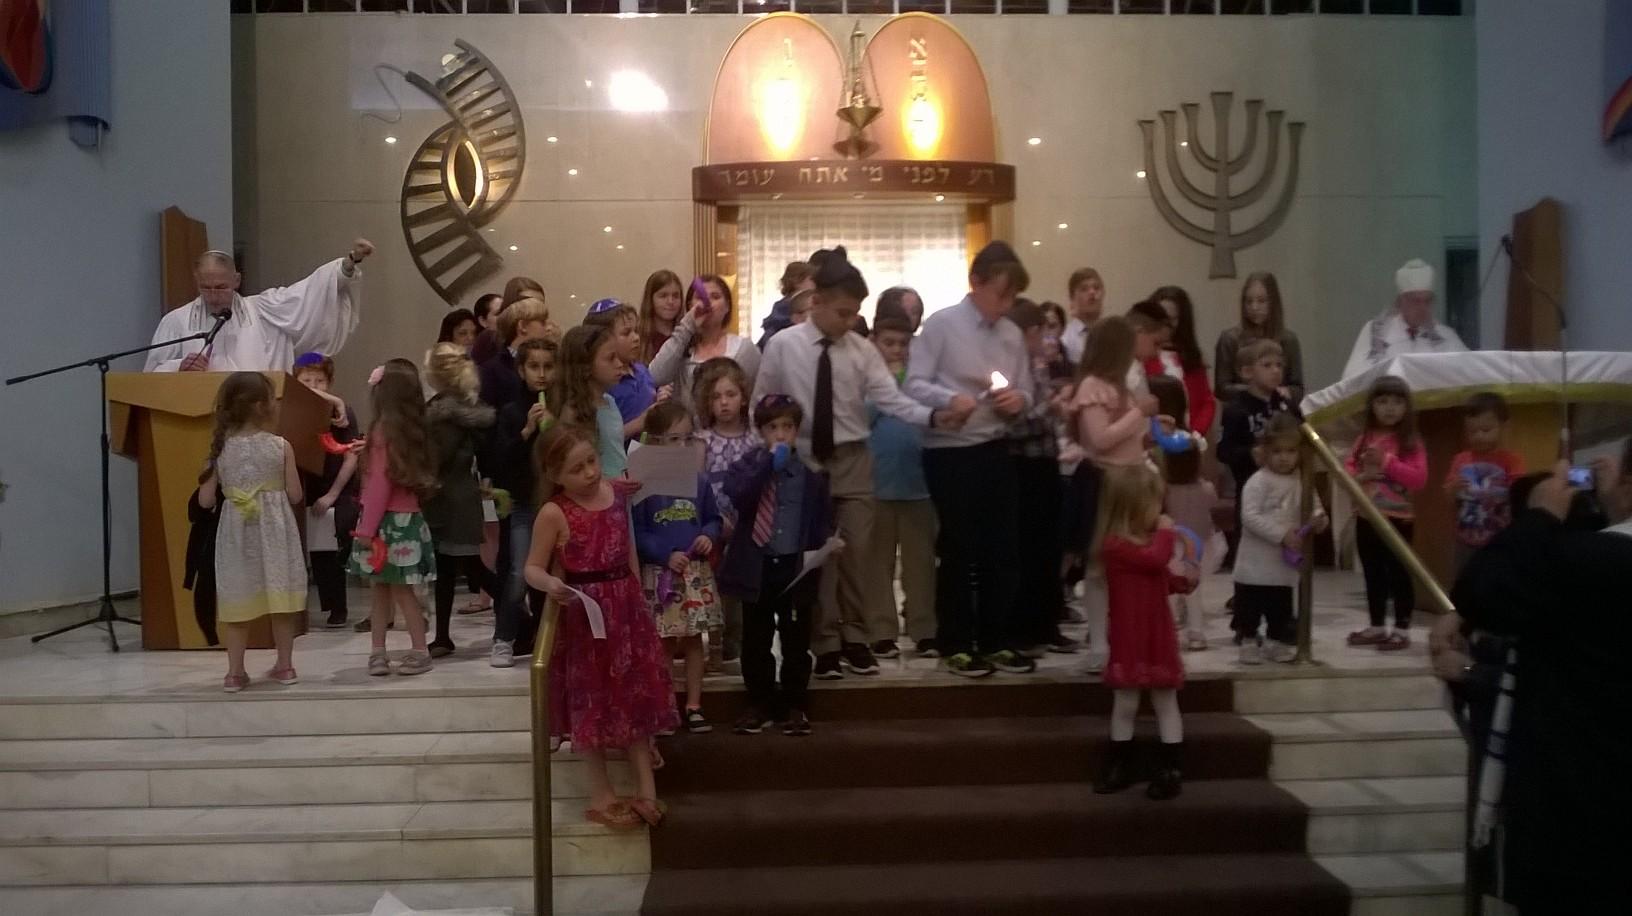 After Yom Kippur services